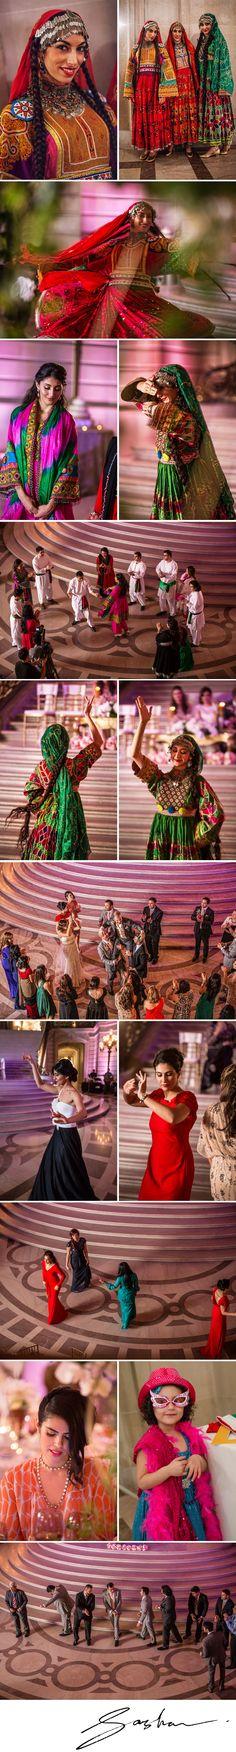 Traditional Afghan dancing ensues. Beautiful! I love my culture.